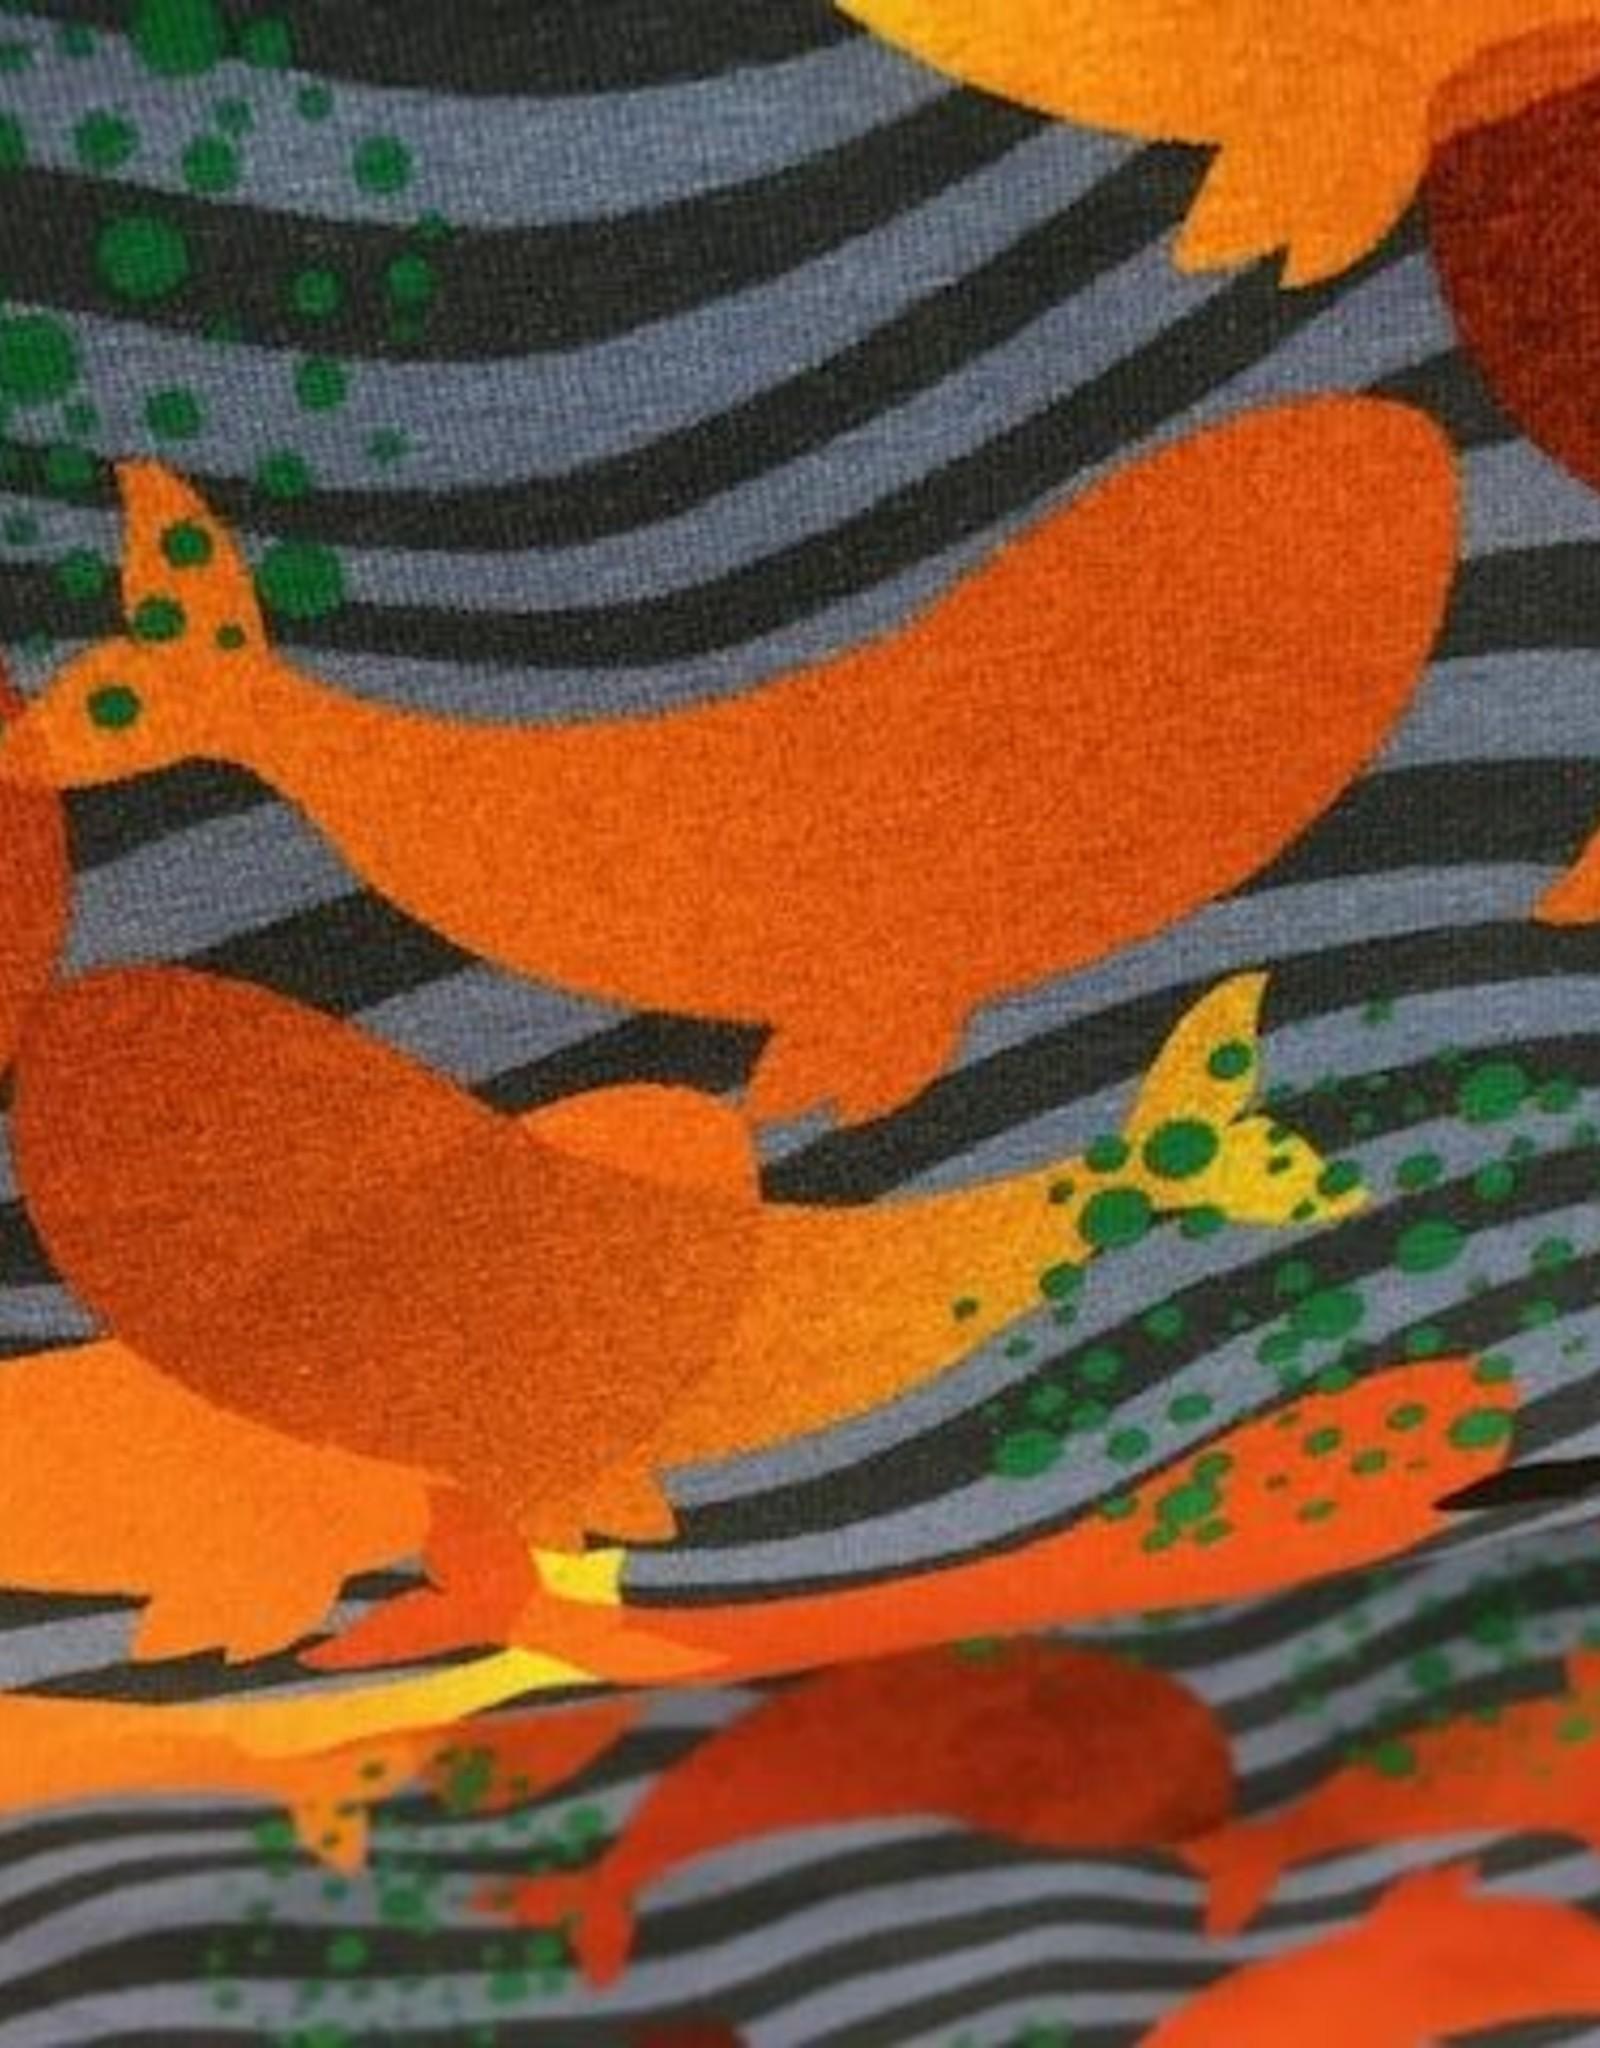 Oranje walvissen in de golven